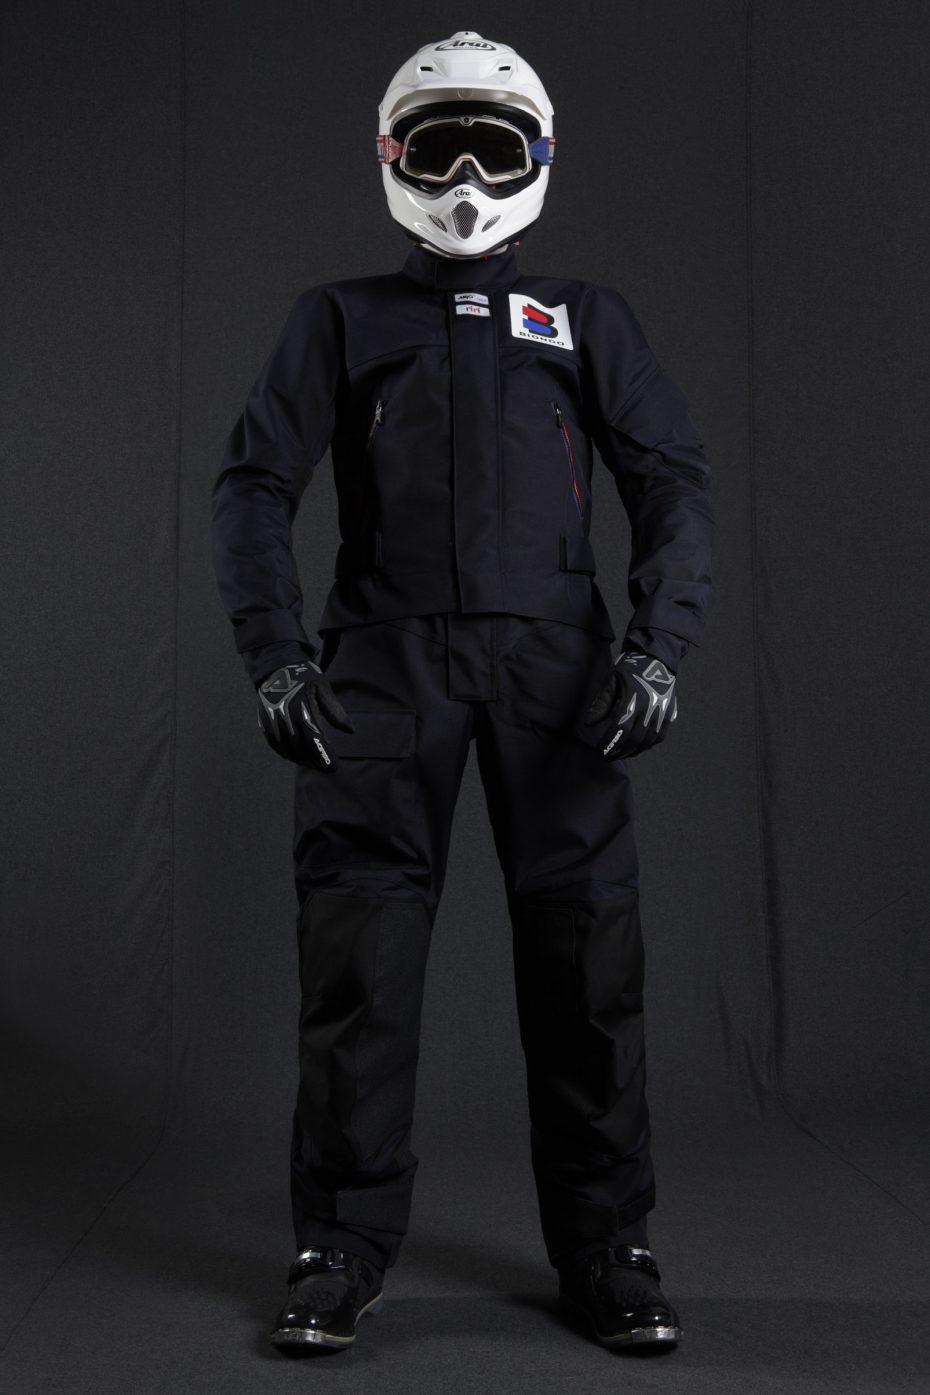 BiondoEndurance_Motorräder_GB_0008_Short-Jacket_DeepBlue_Portrait_Front